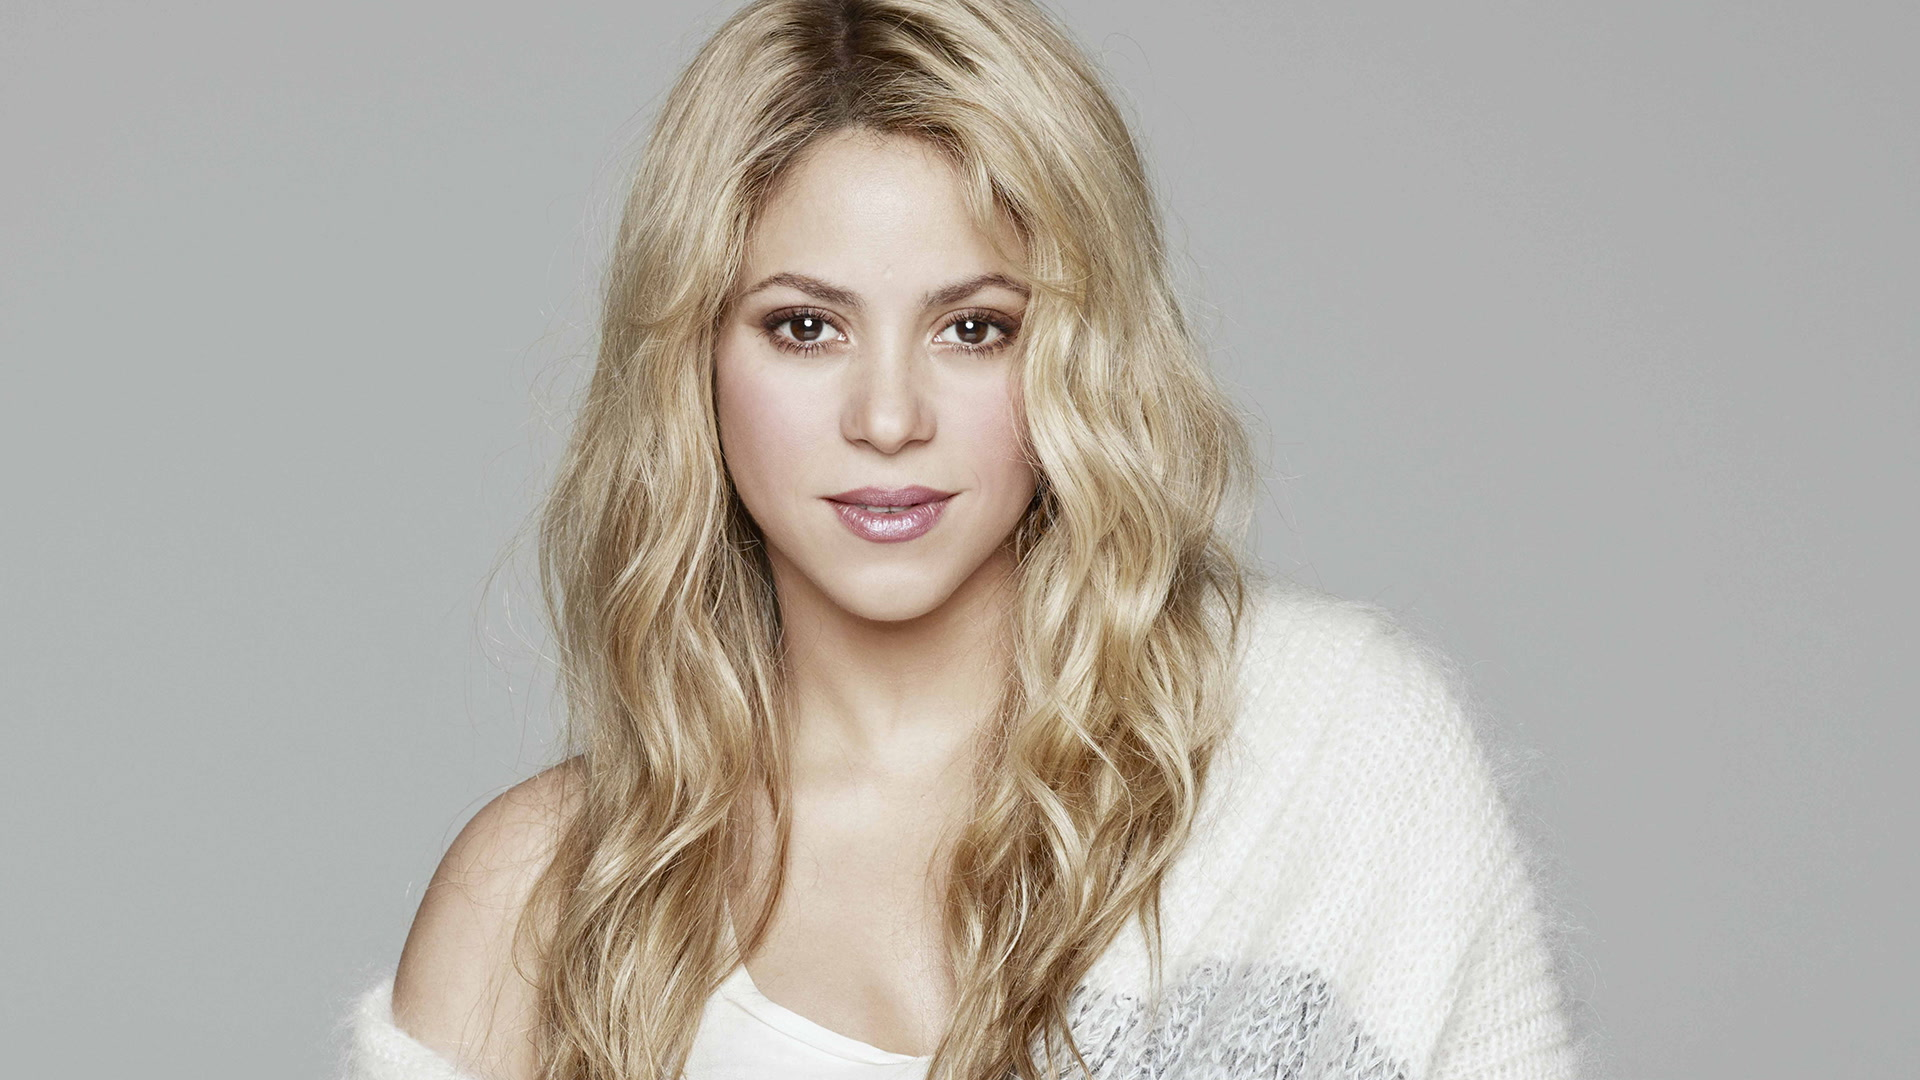 La 'reina del Waka-Waka': la verdadera historia de Shakira